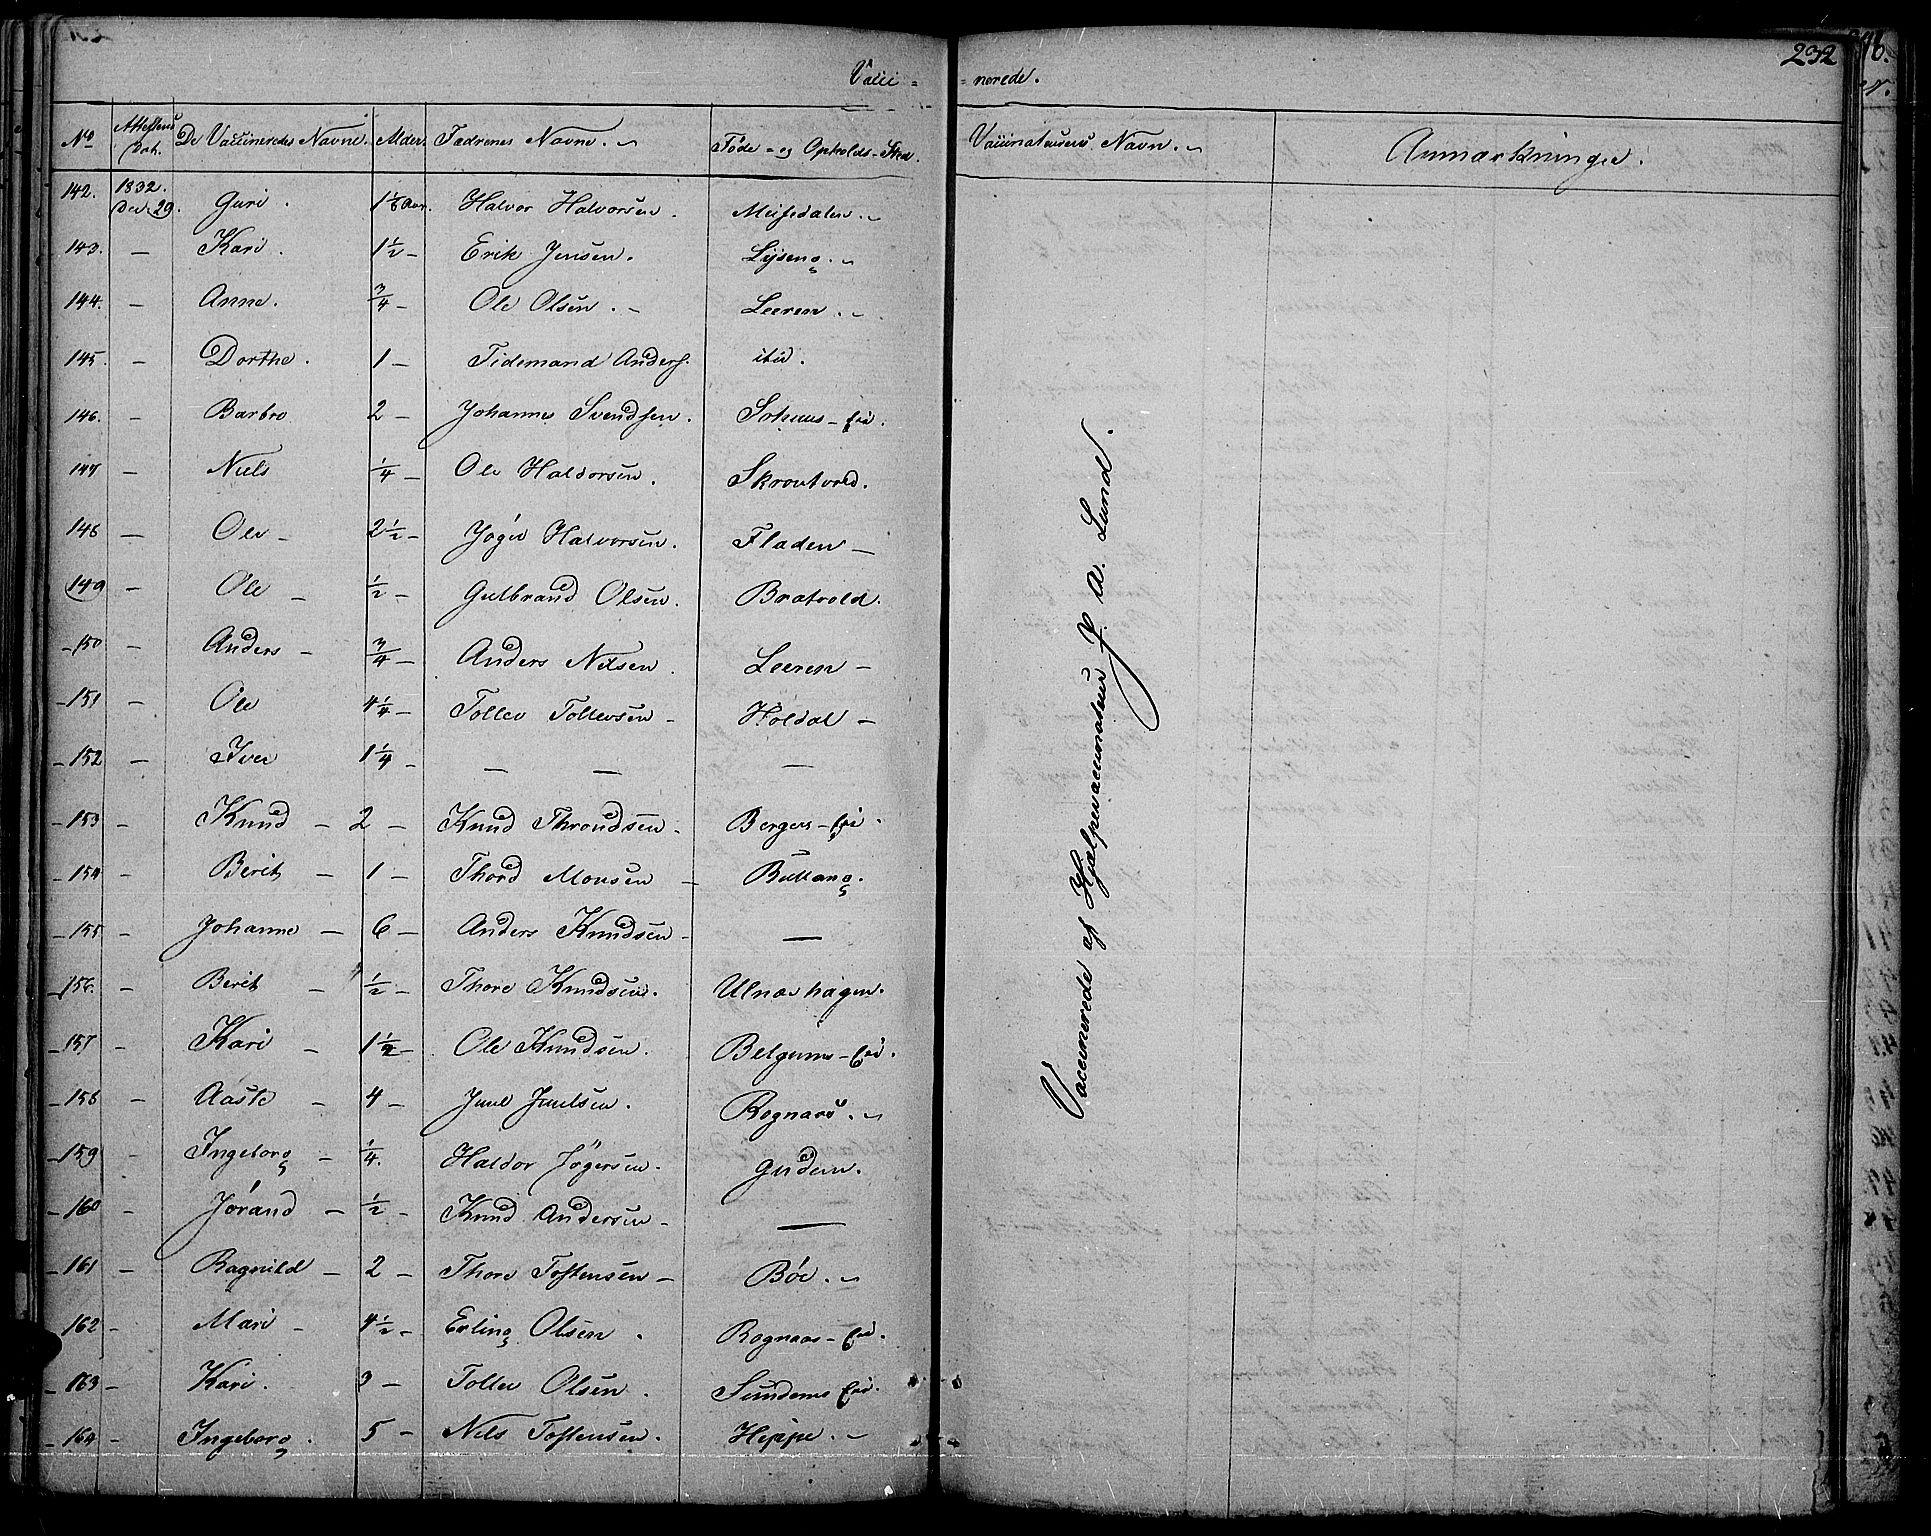 SAH, Nord-Aurdal prestekontor, Ministerialbok nr. 3, 1828-1841, s. 232